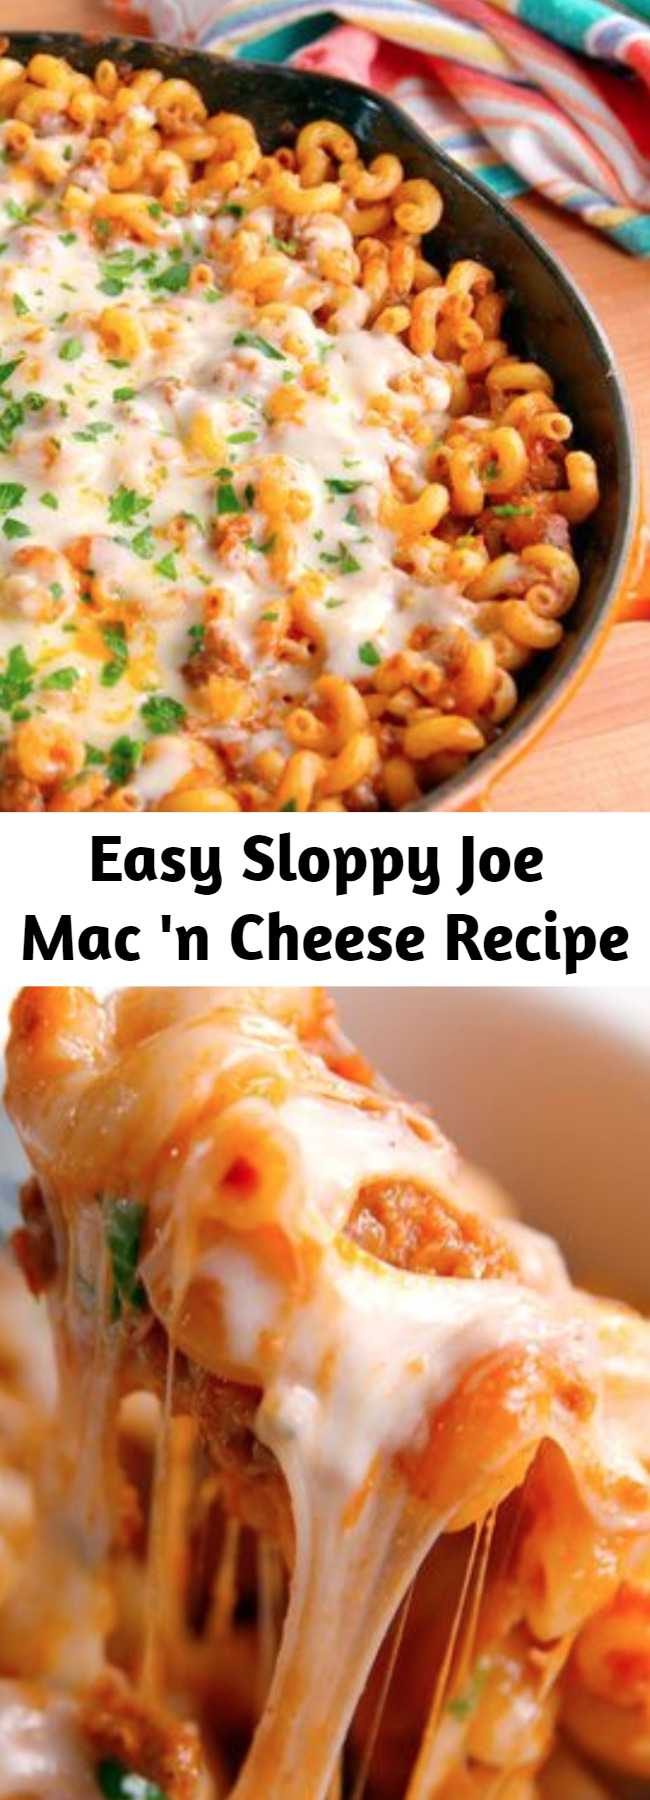 Easy Sloppy Joe Mac 'n Cheese Recipe - Bolognese is too high-brow for a busy weeknight, you need sloppy joe mac n cheese. #pasta #easyrecipes #macandcheese #dinnerideas #recipe #easy #sloppyjoe #casserole